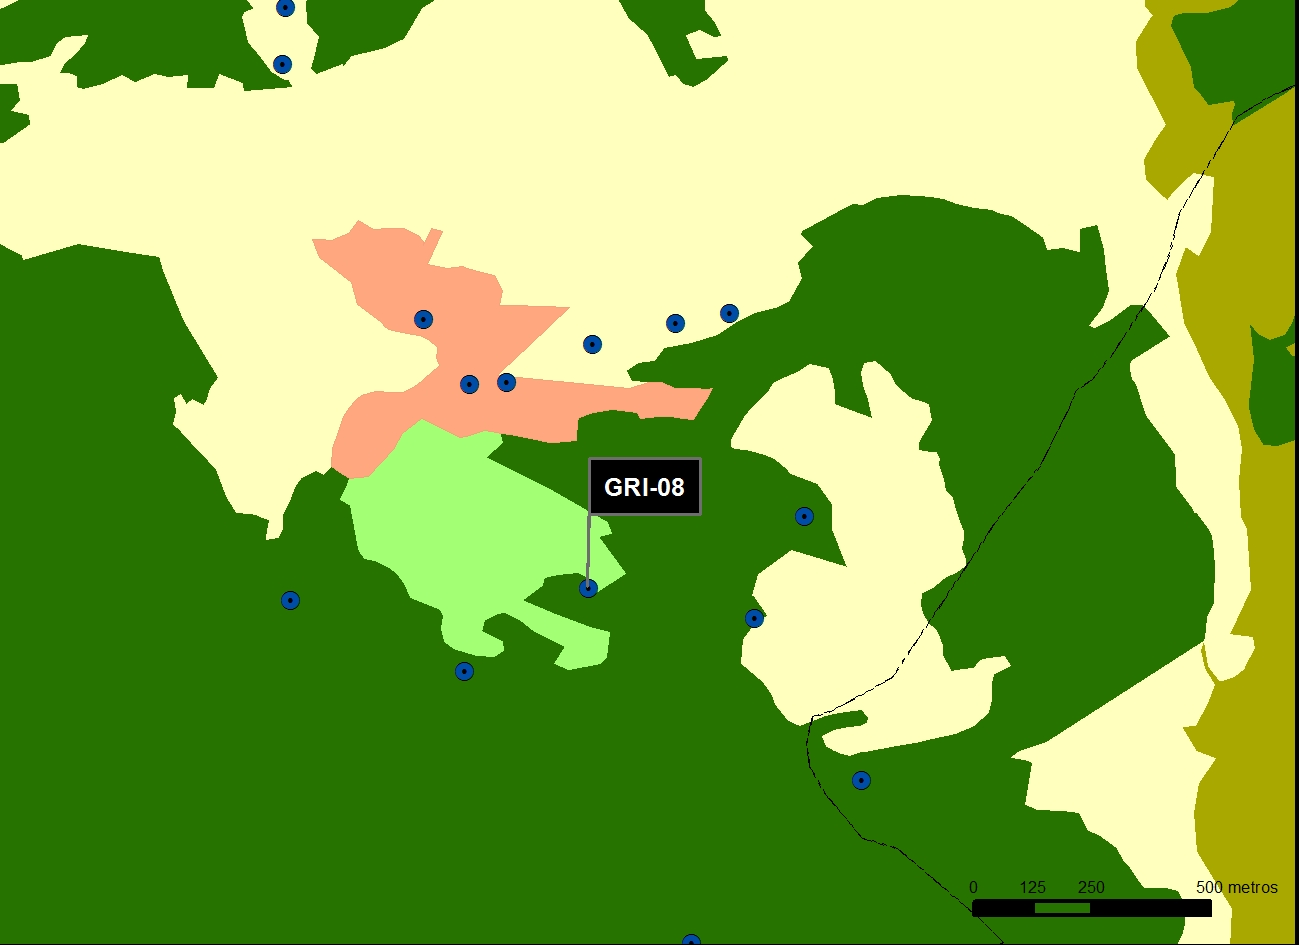 GRI_08_M.V.LOZANO_MALENA_MAP.VEG